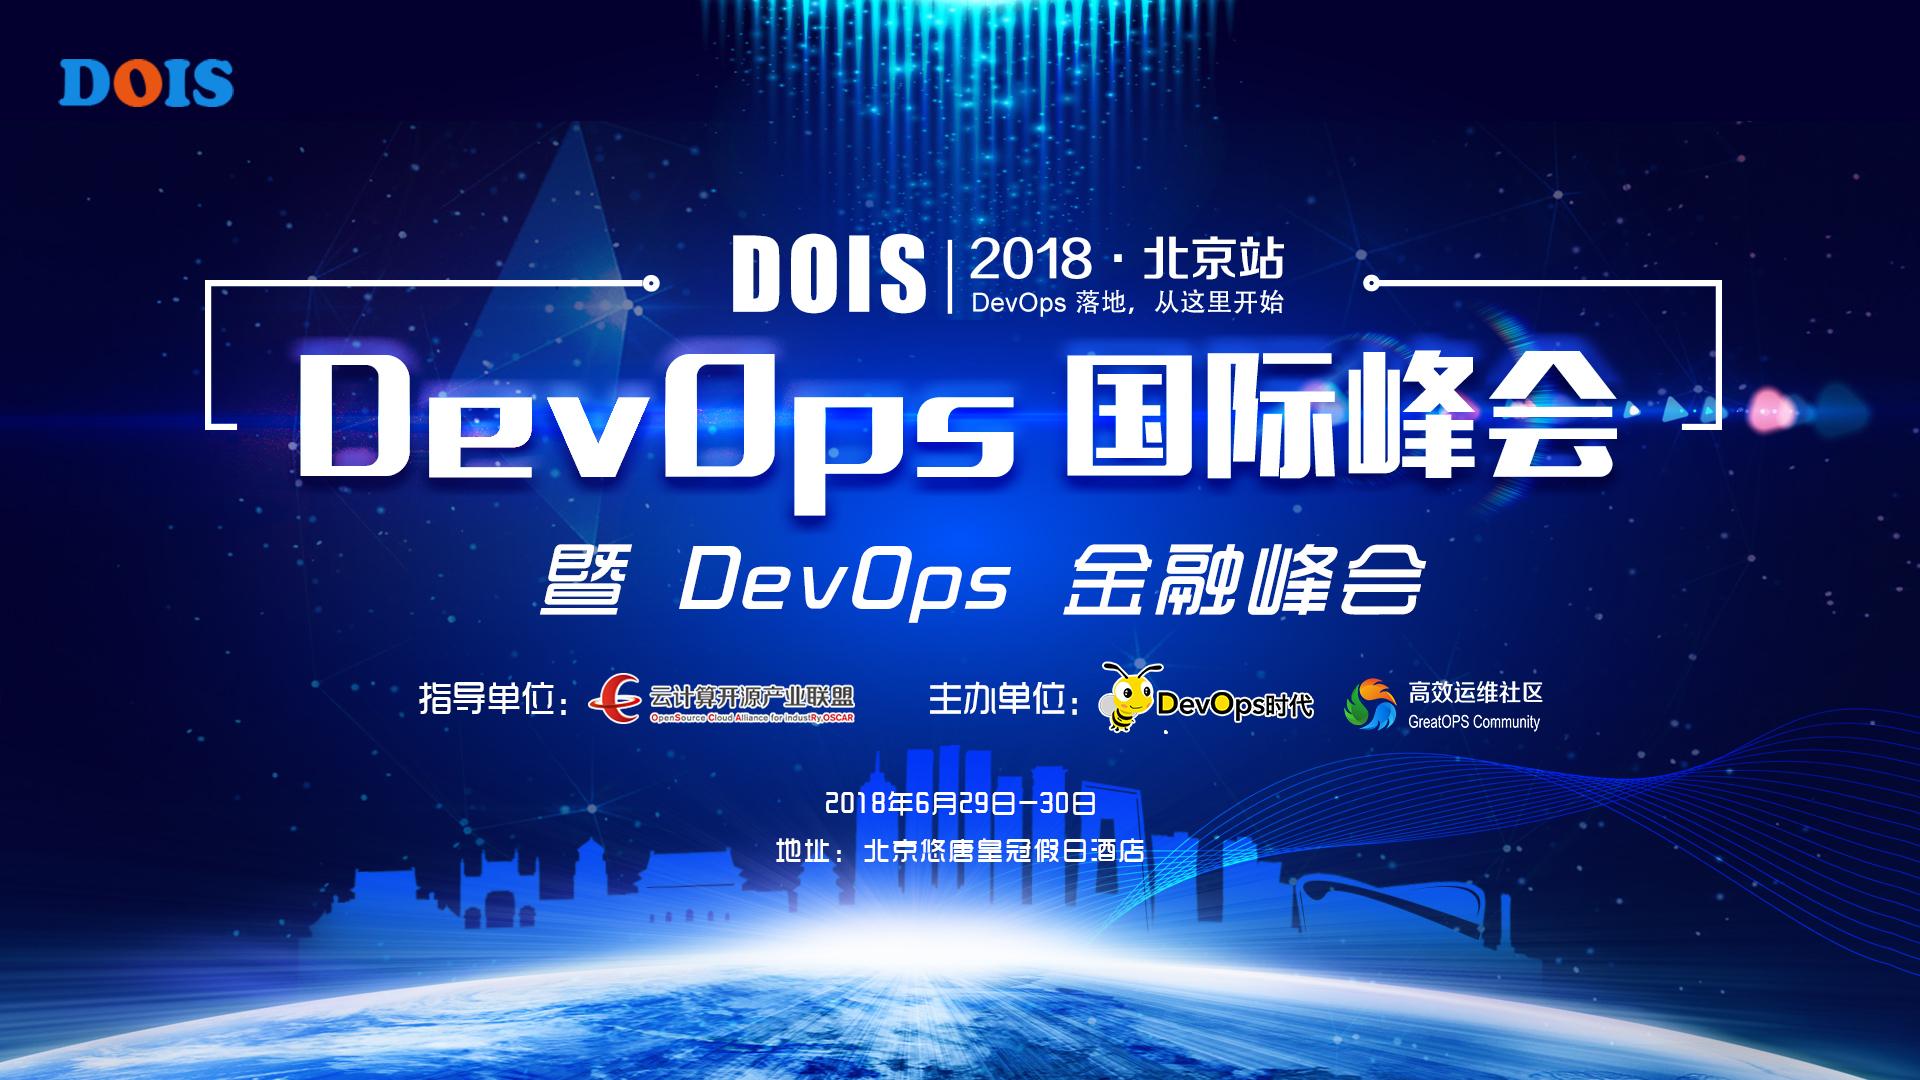 DOIS2018 北京站专题对话:腾讯织云梁定安